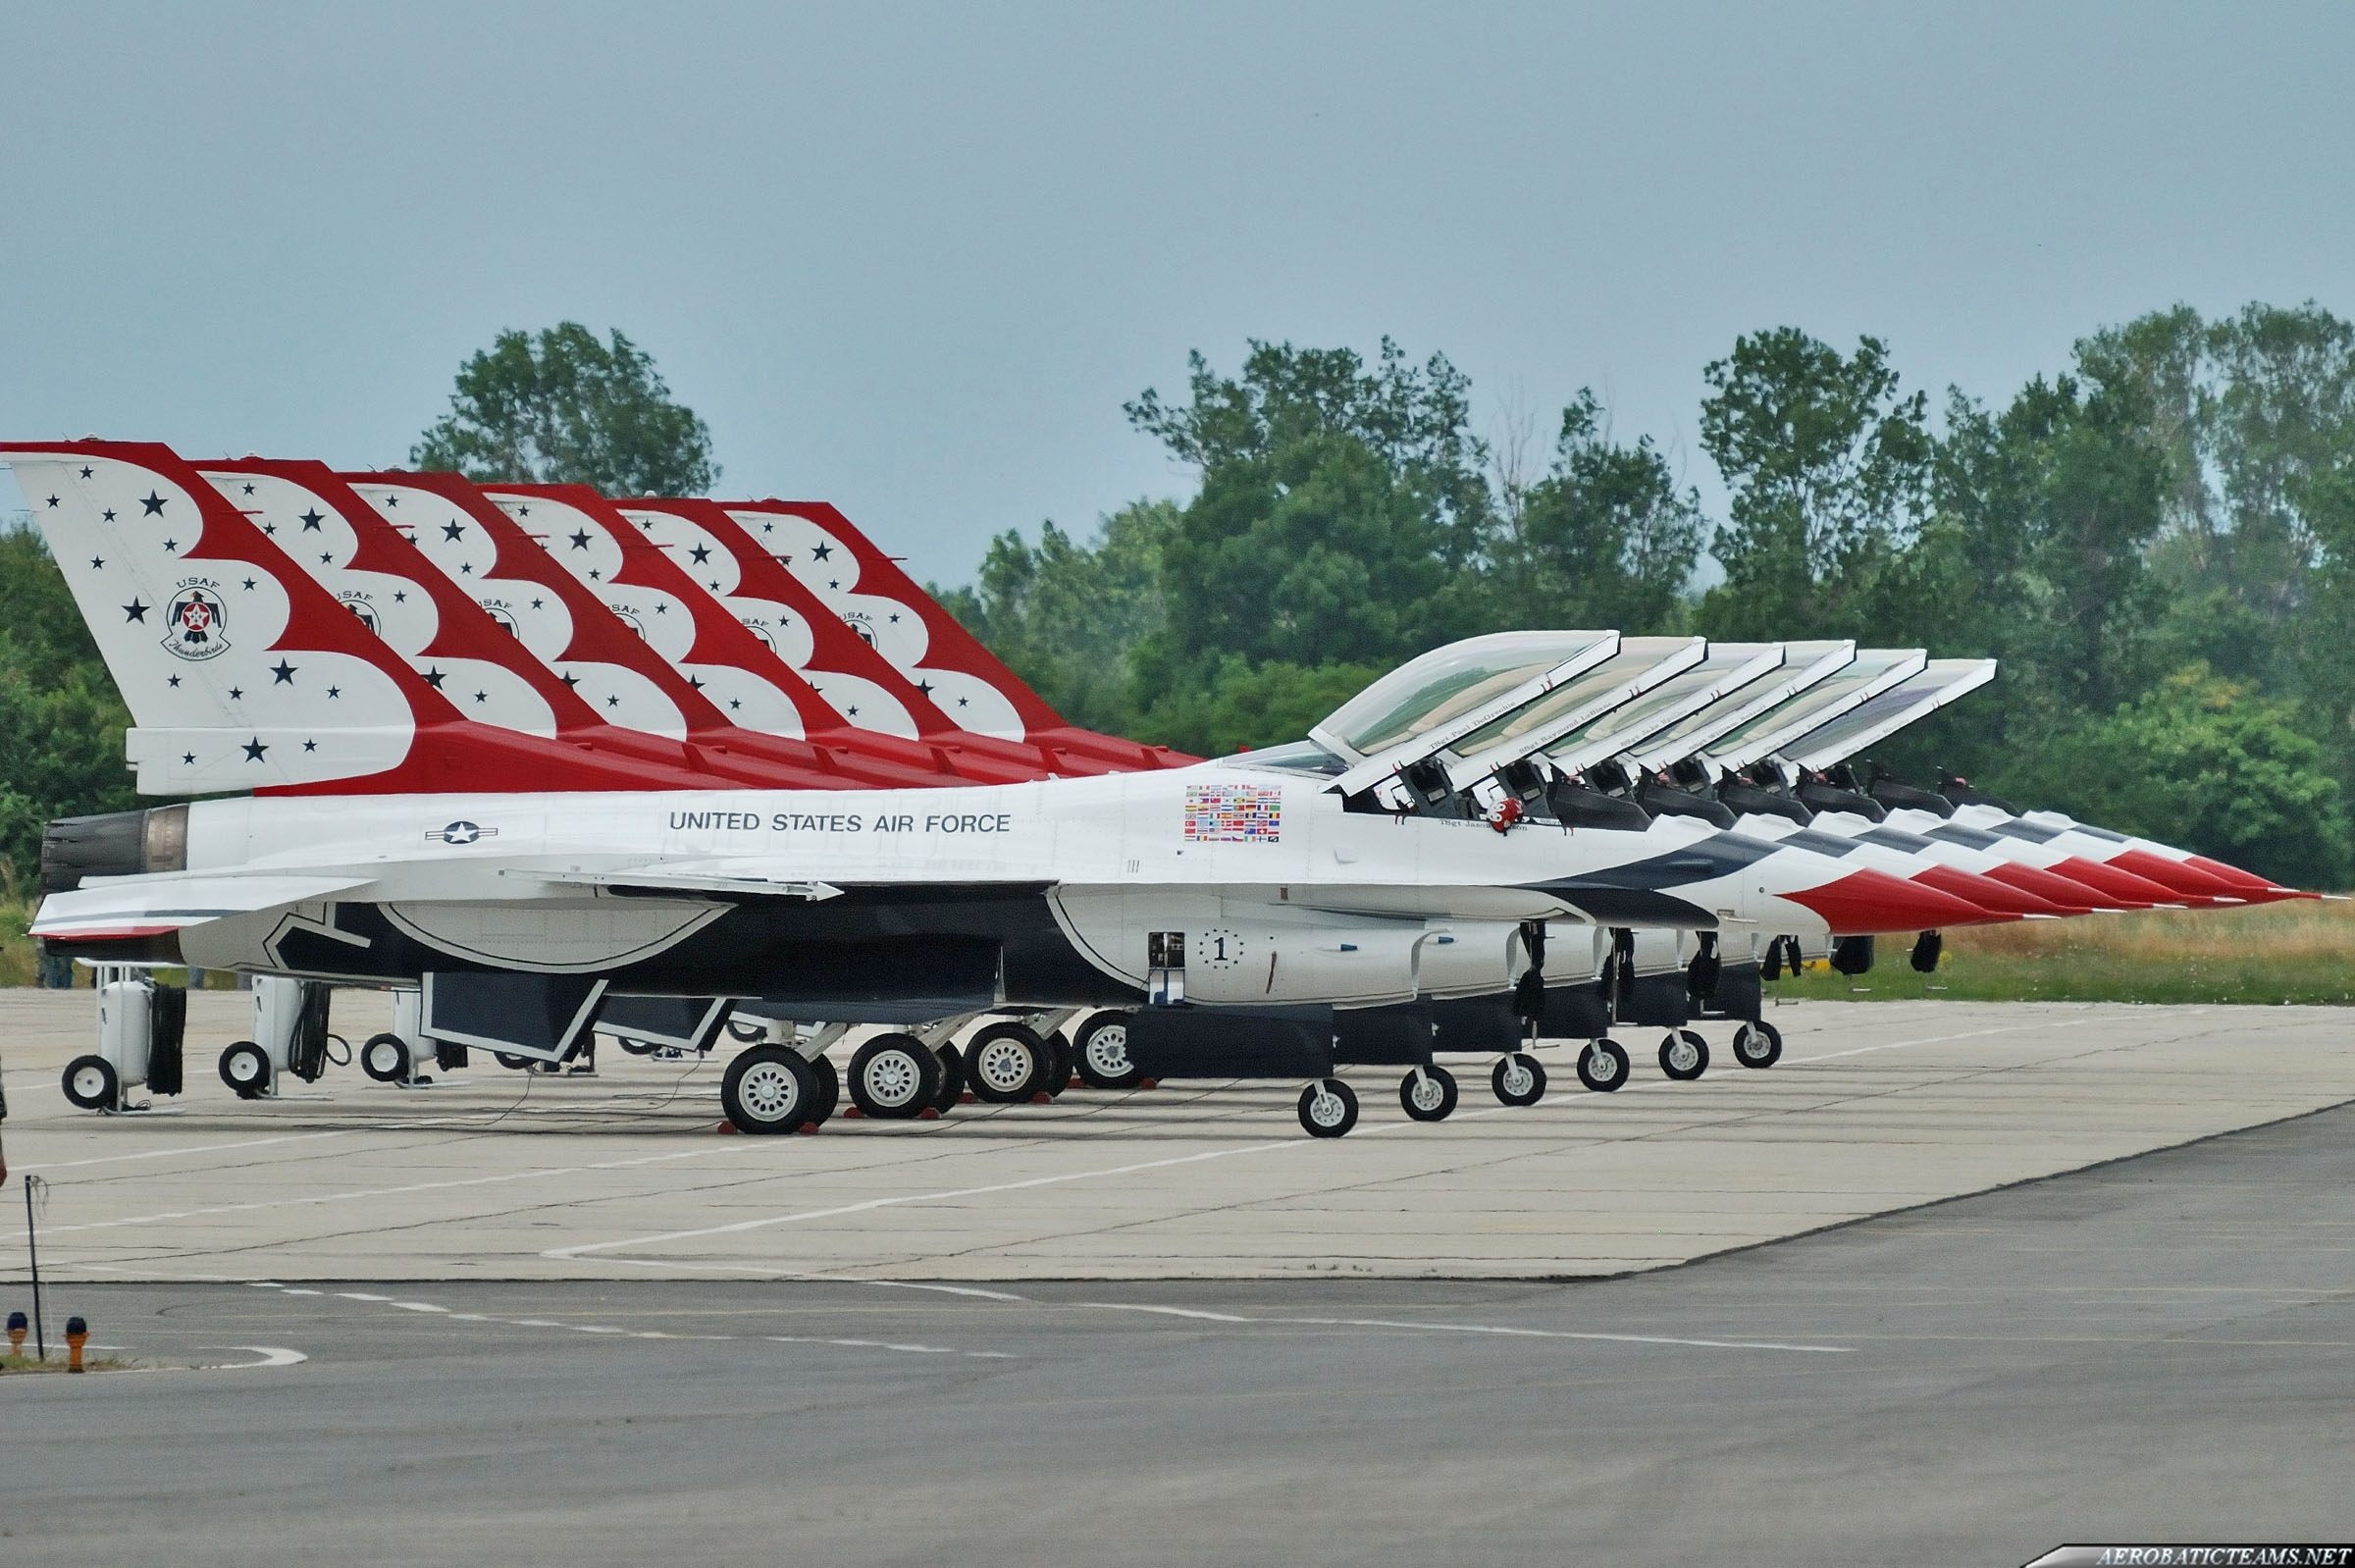 Thunderbirds at Graf Ignatievo Air Base in Bulgaria